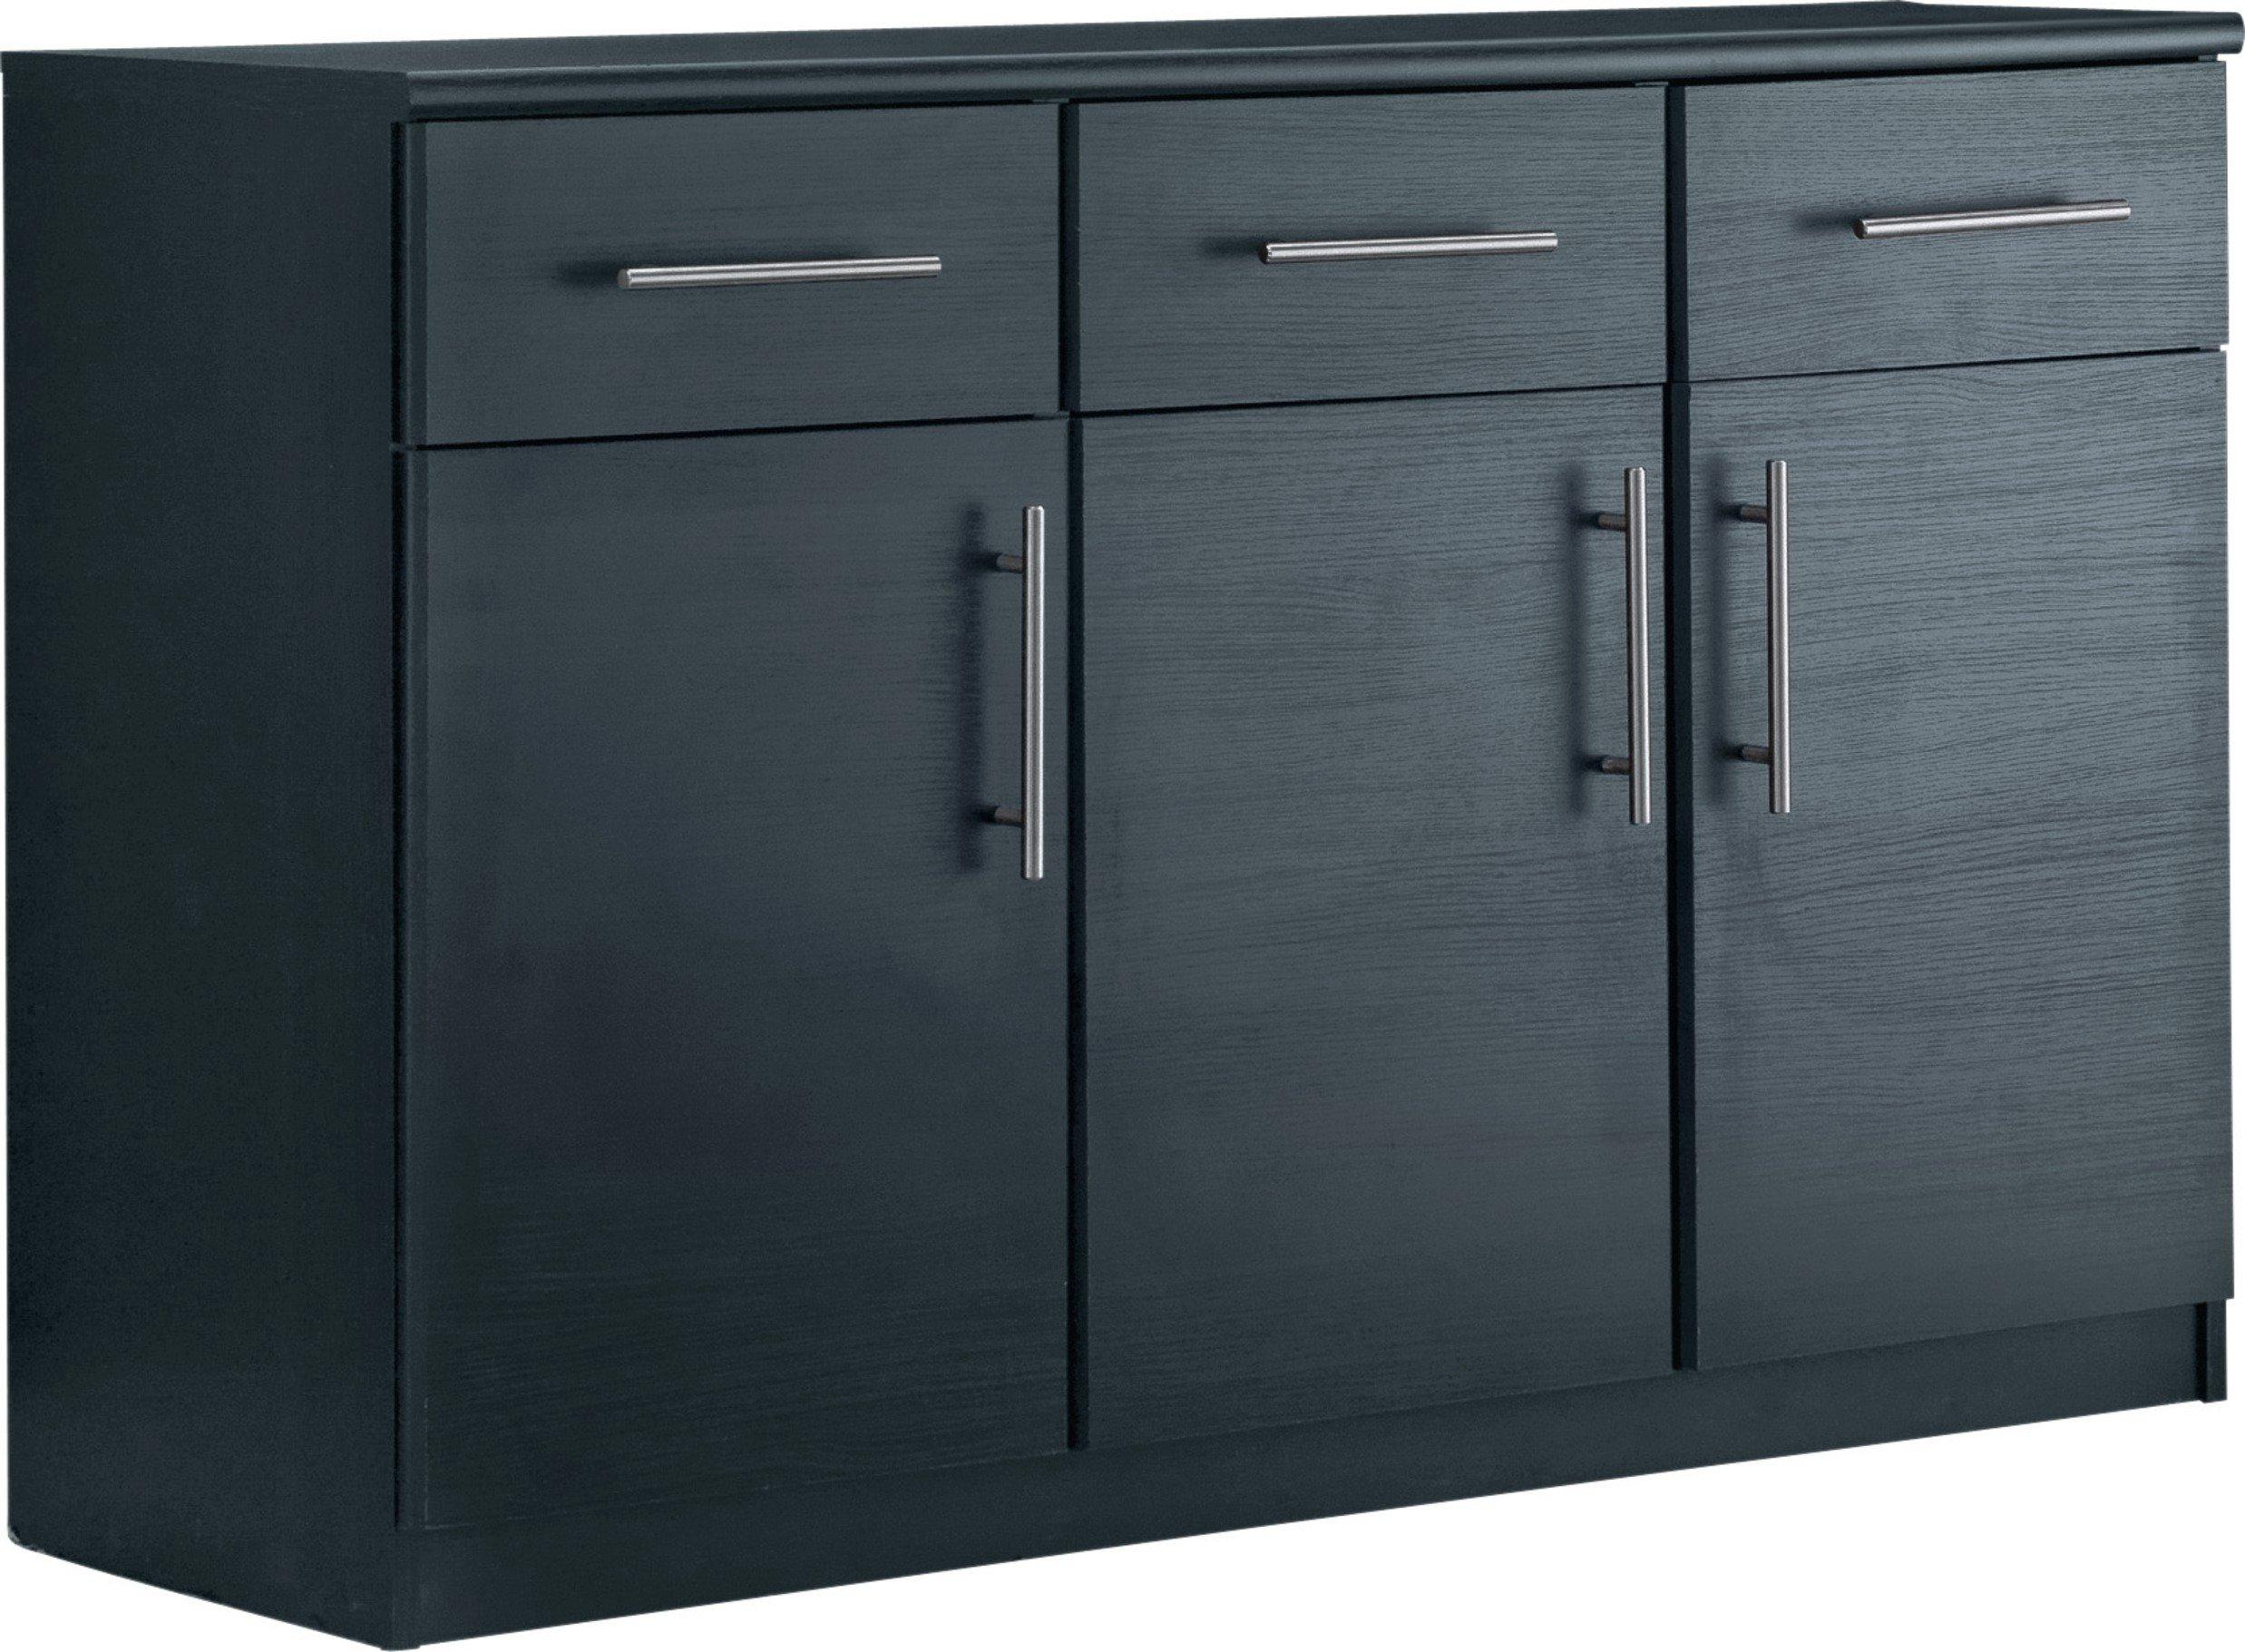 Argos Home Anderson 3 Door 3 Drawer Sideboard - Black